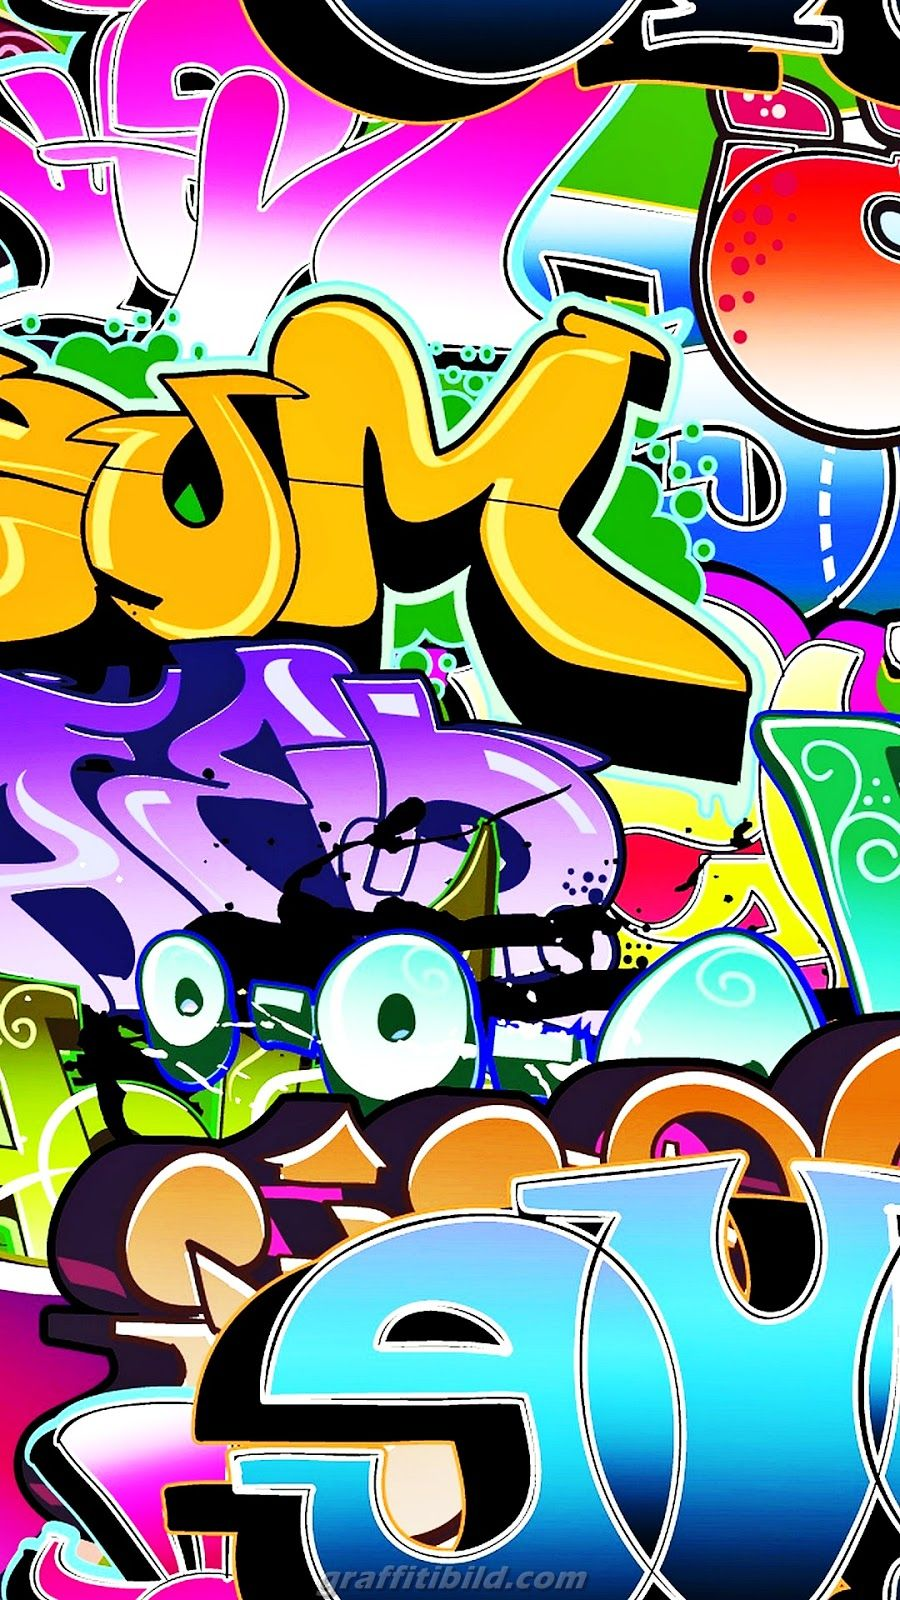 Graffiti wallpaper for android phone hd Graffiti